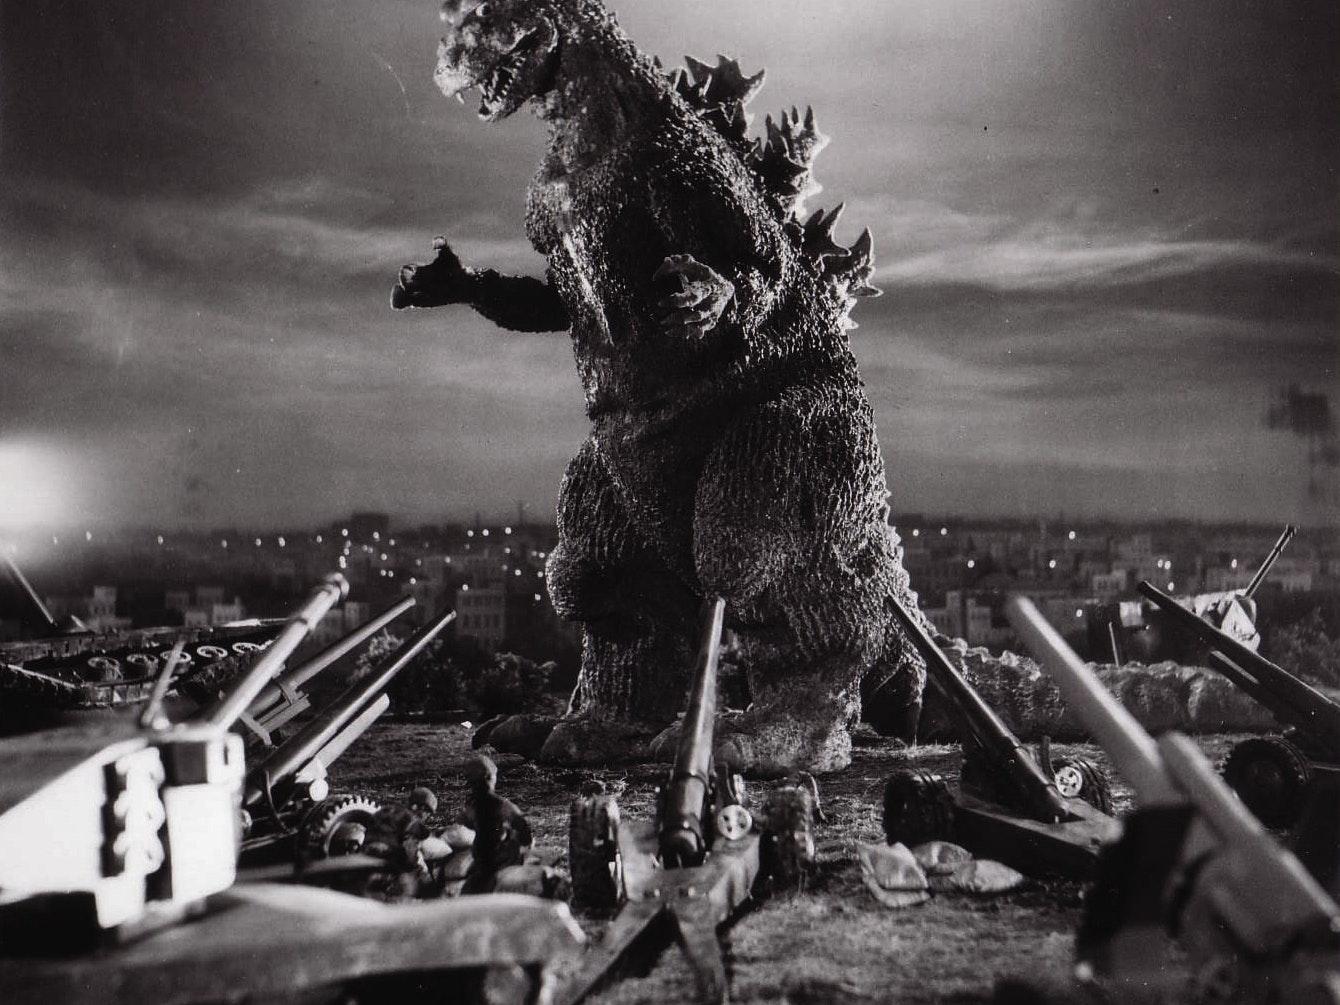 So, Does Godzilla Have a Penis?